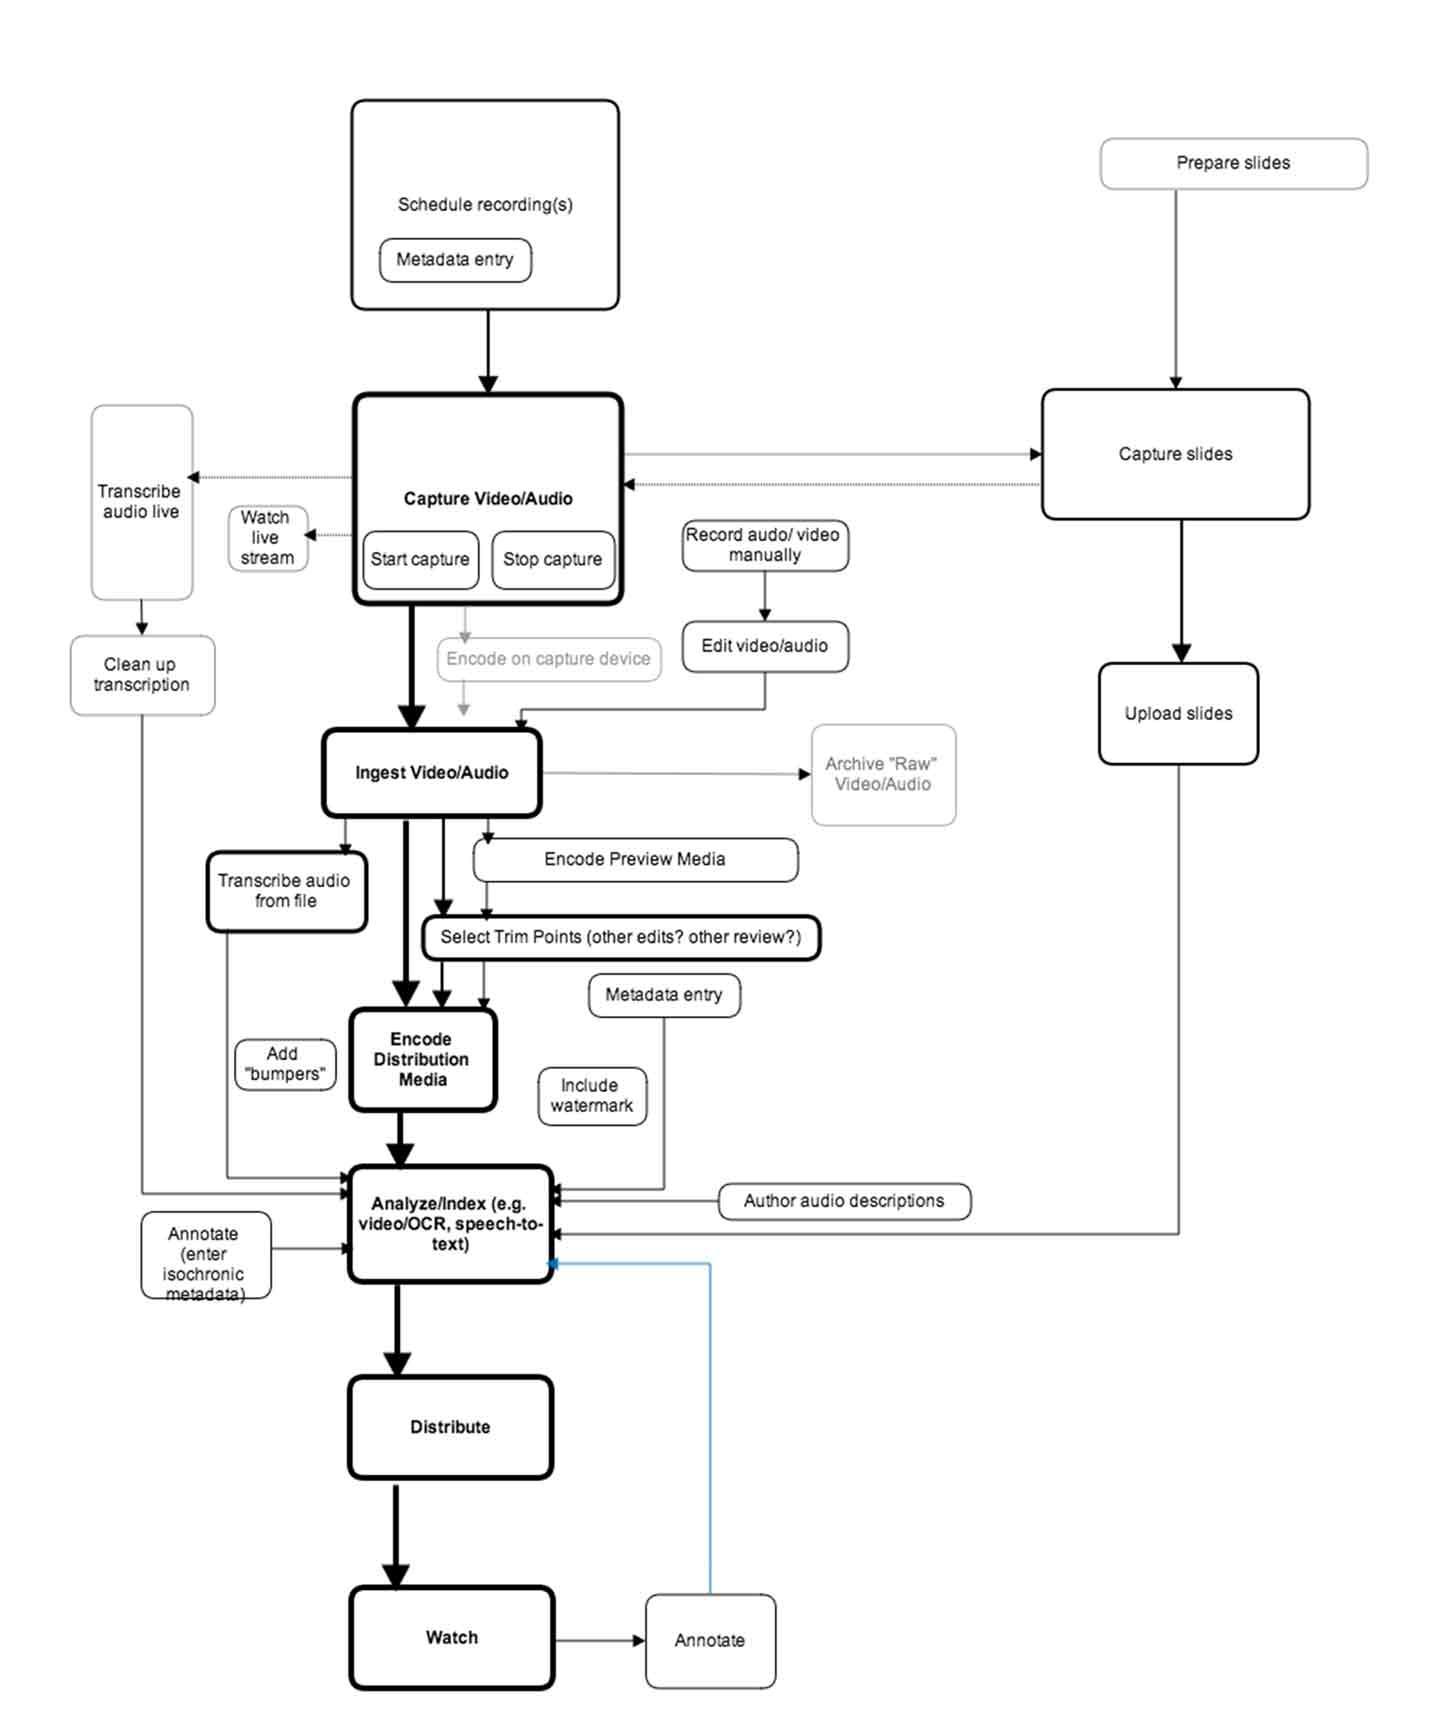 generalized-workflow-copy_REV1_web_Low_7